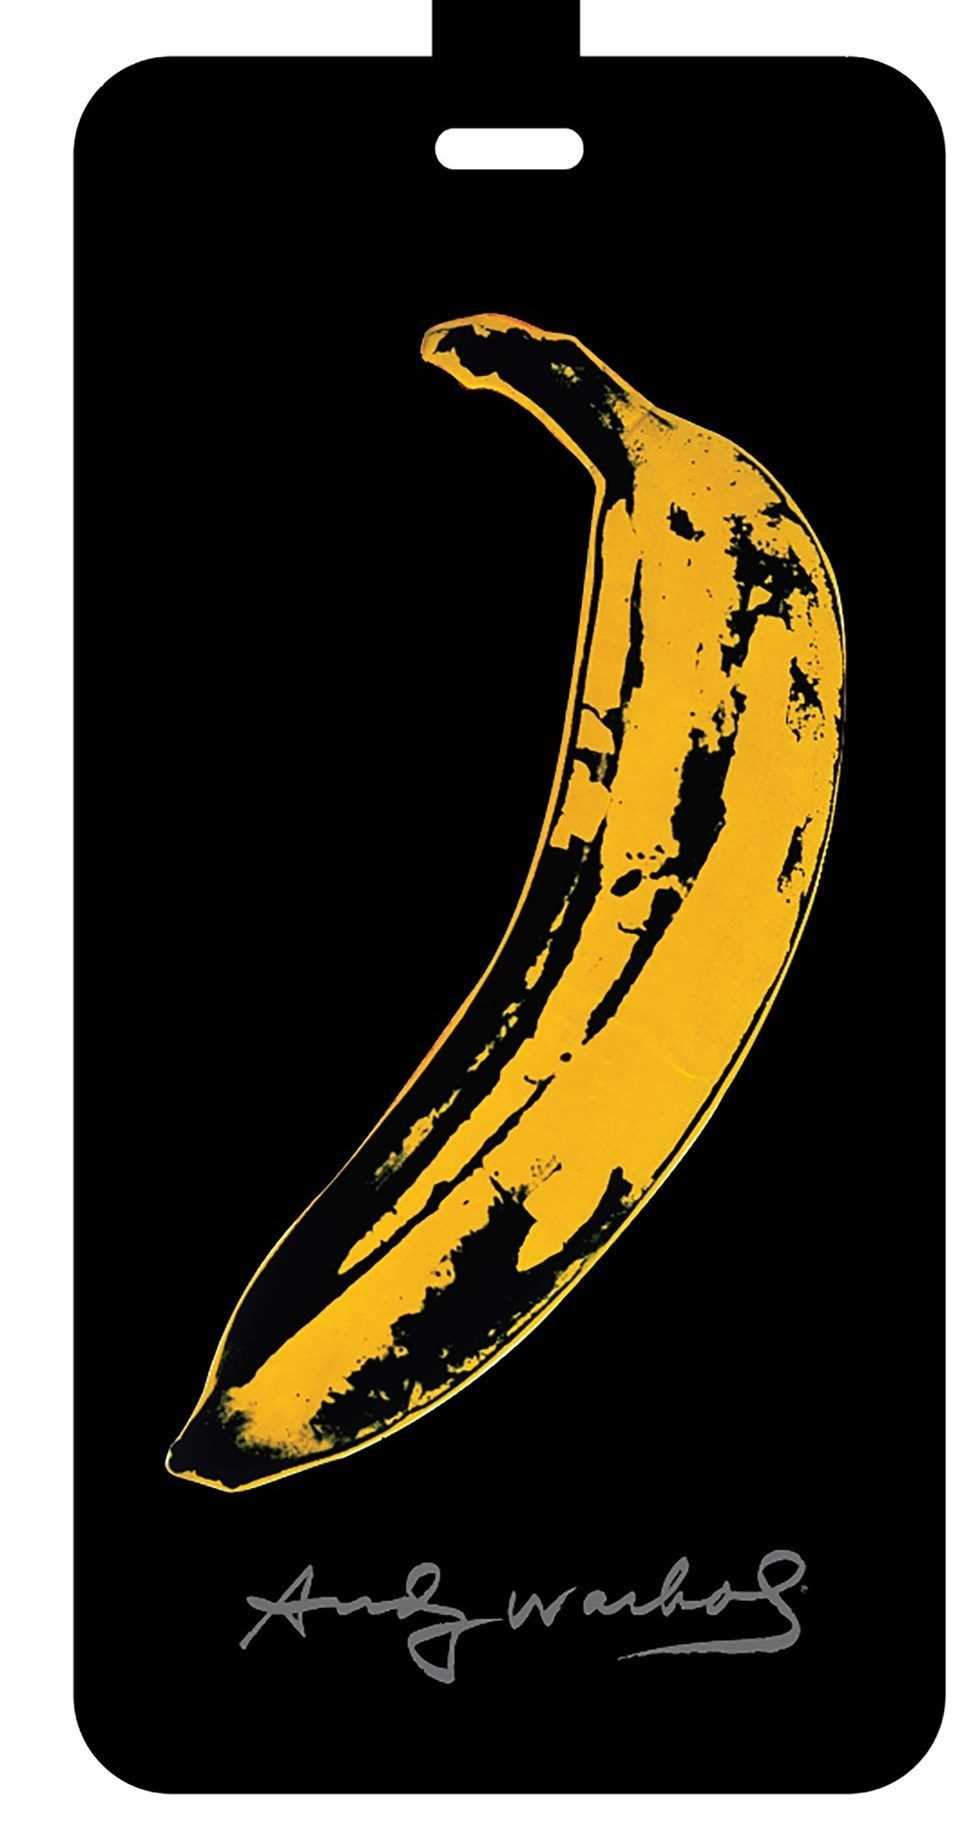 Andy Warhol Banana Luggage Tag